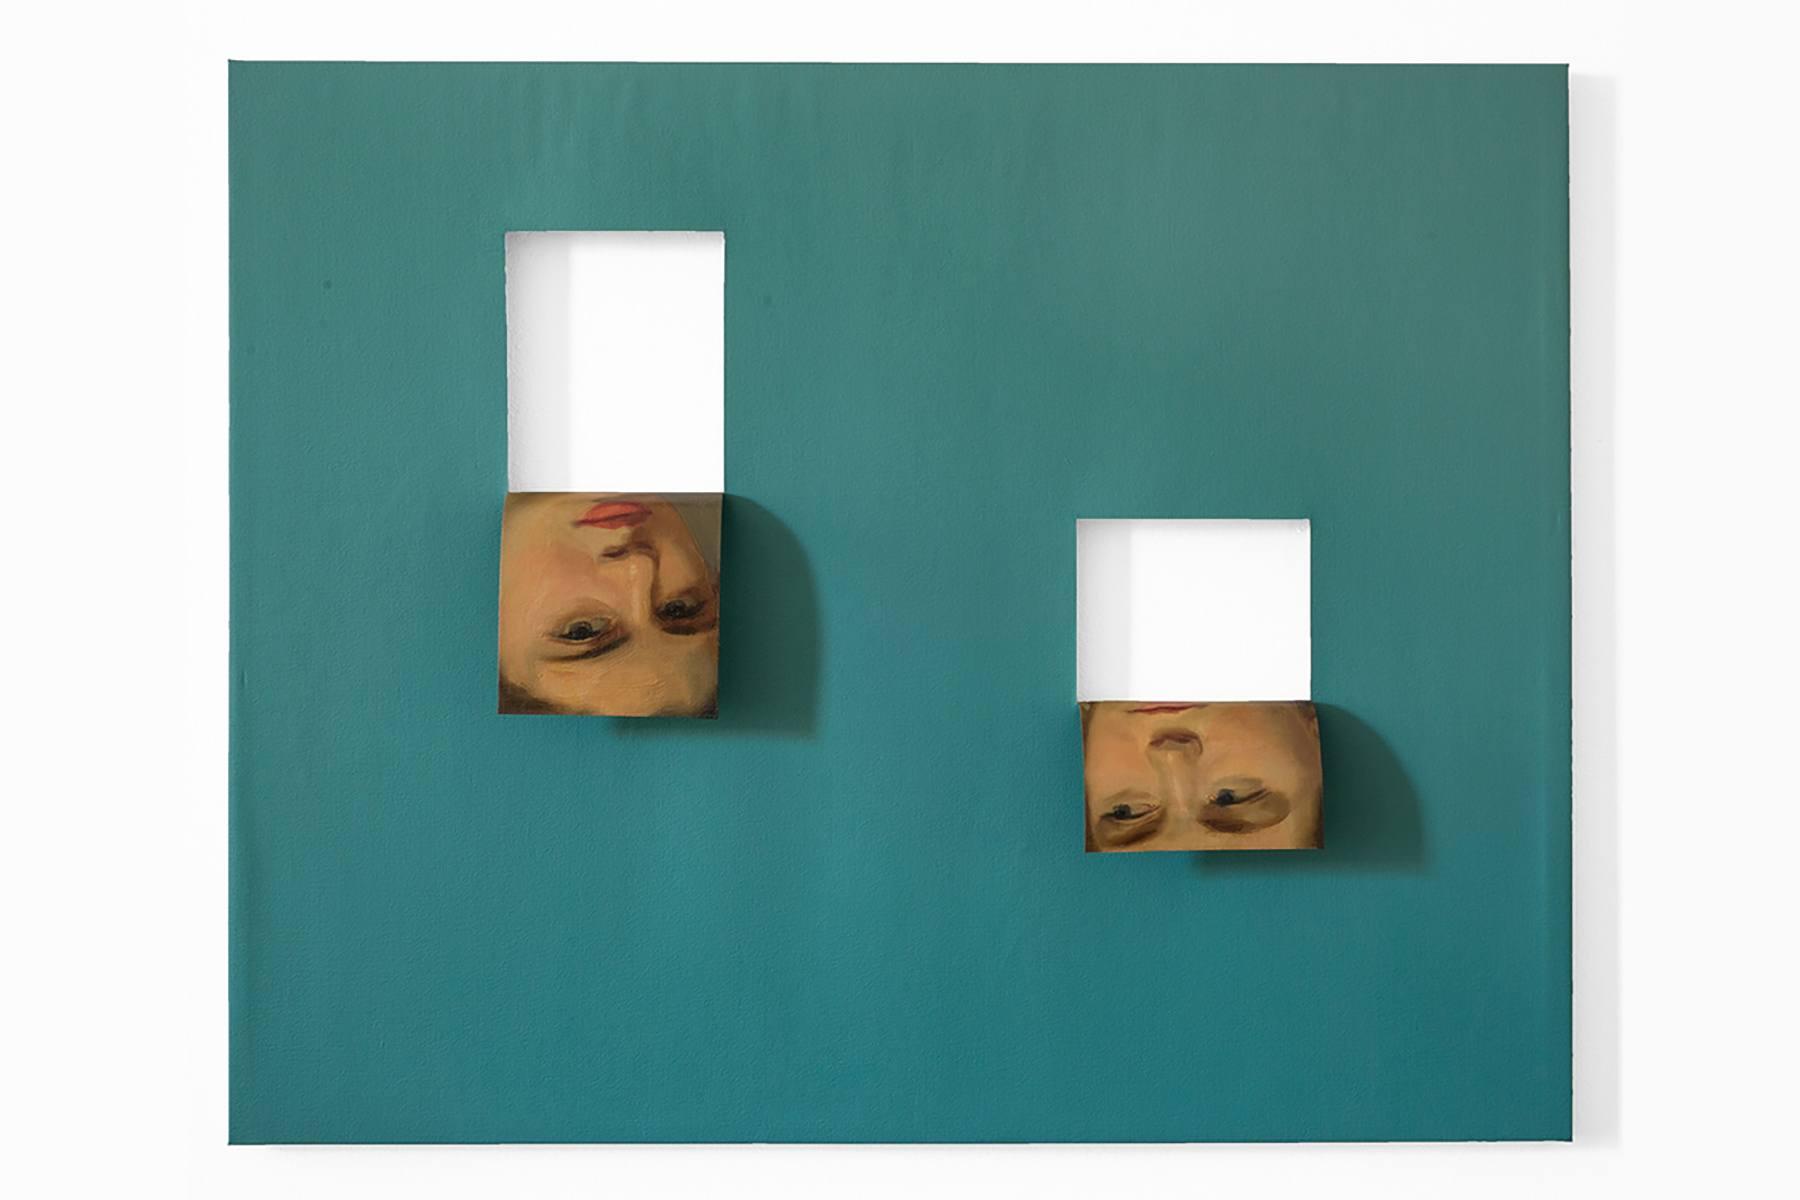 IGNANT-Art-Valeska-Soares-Doubleface-8